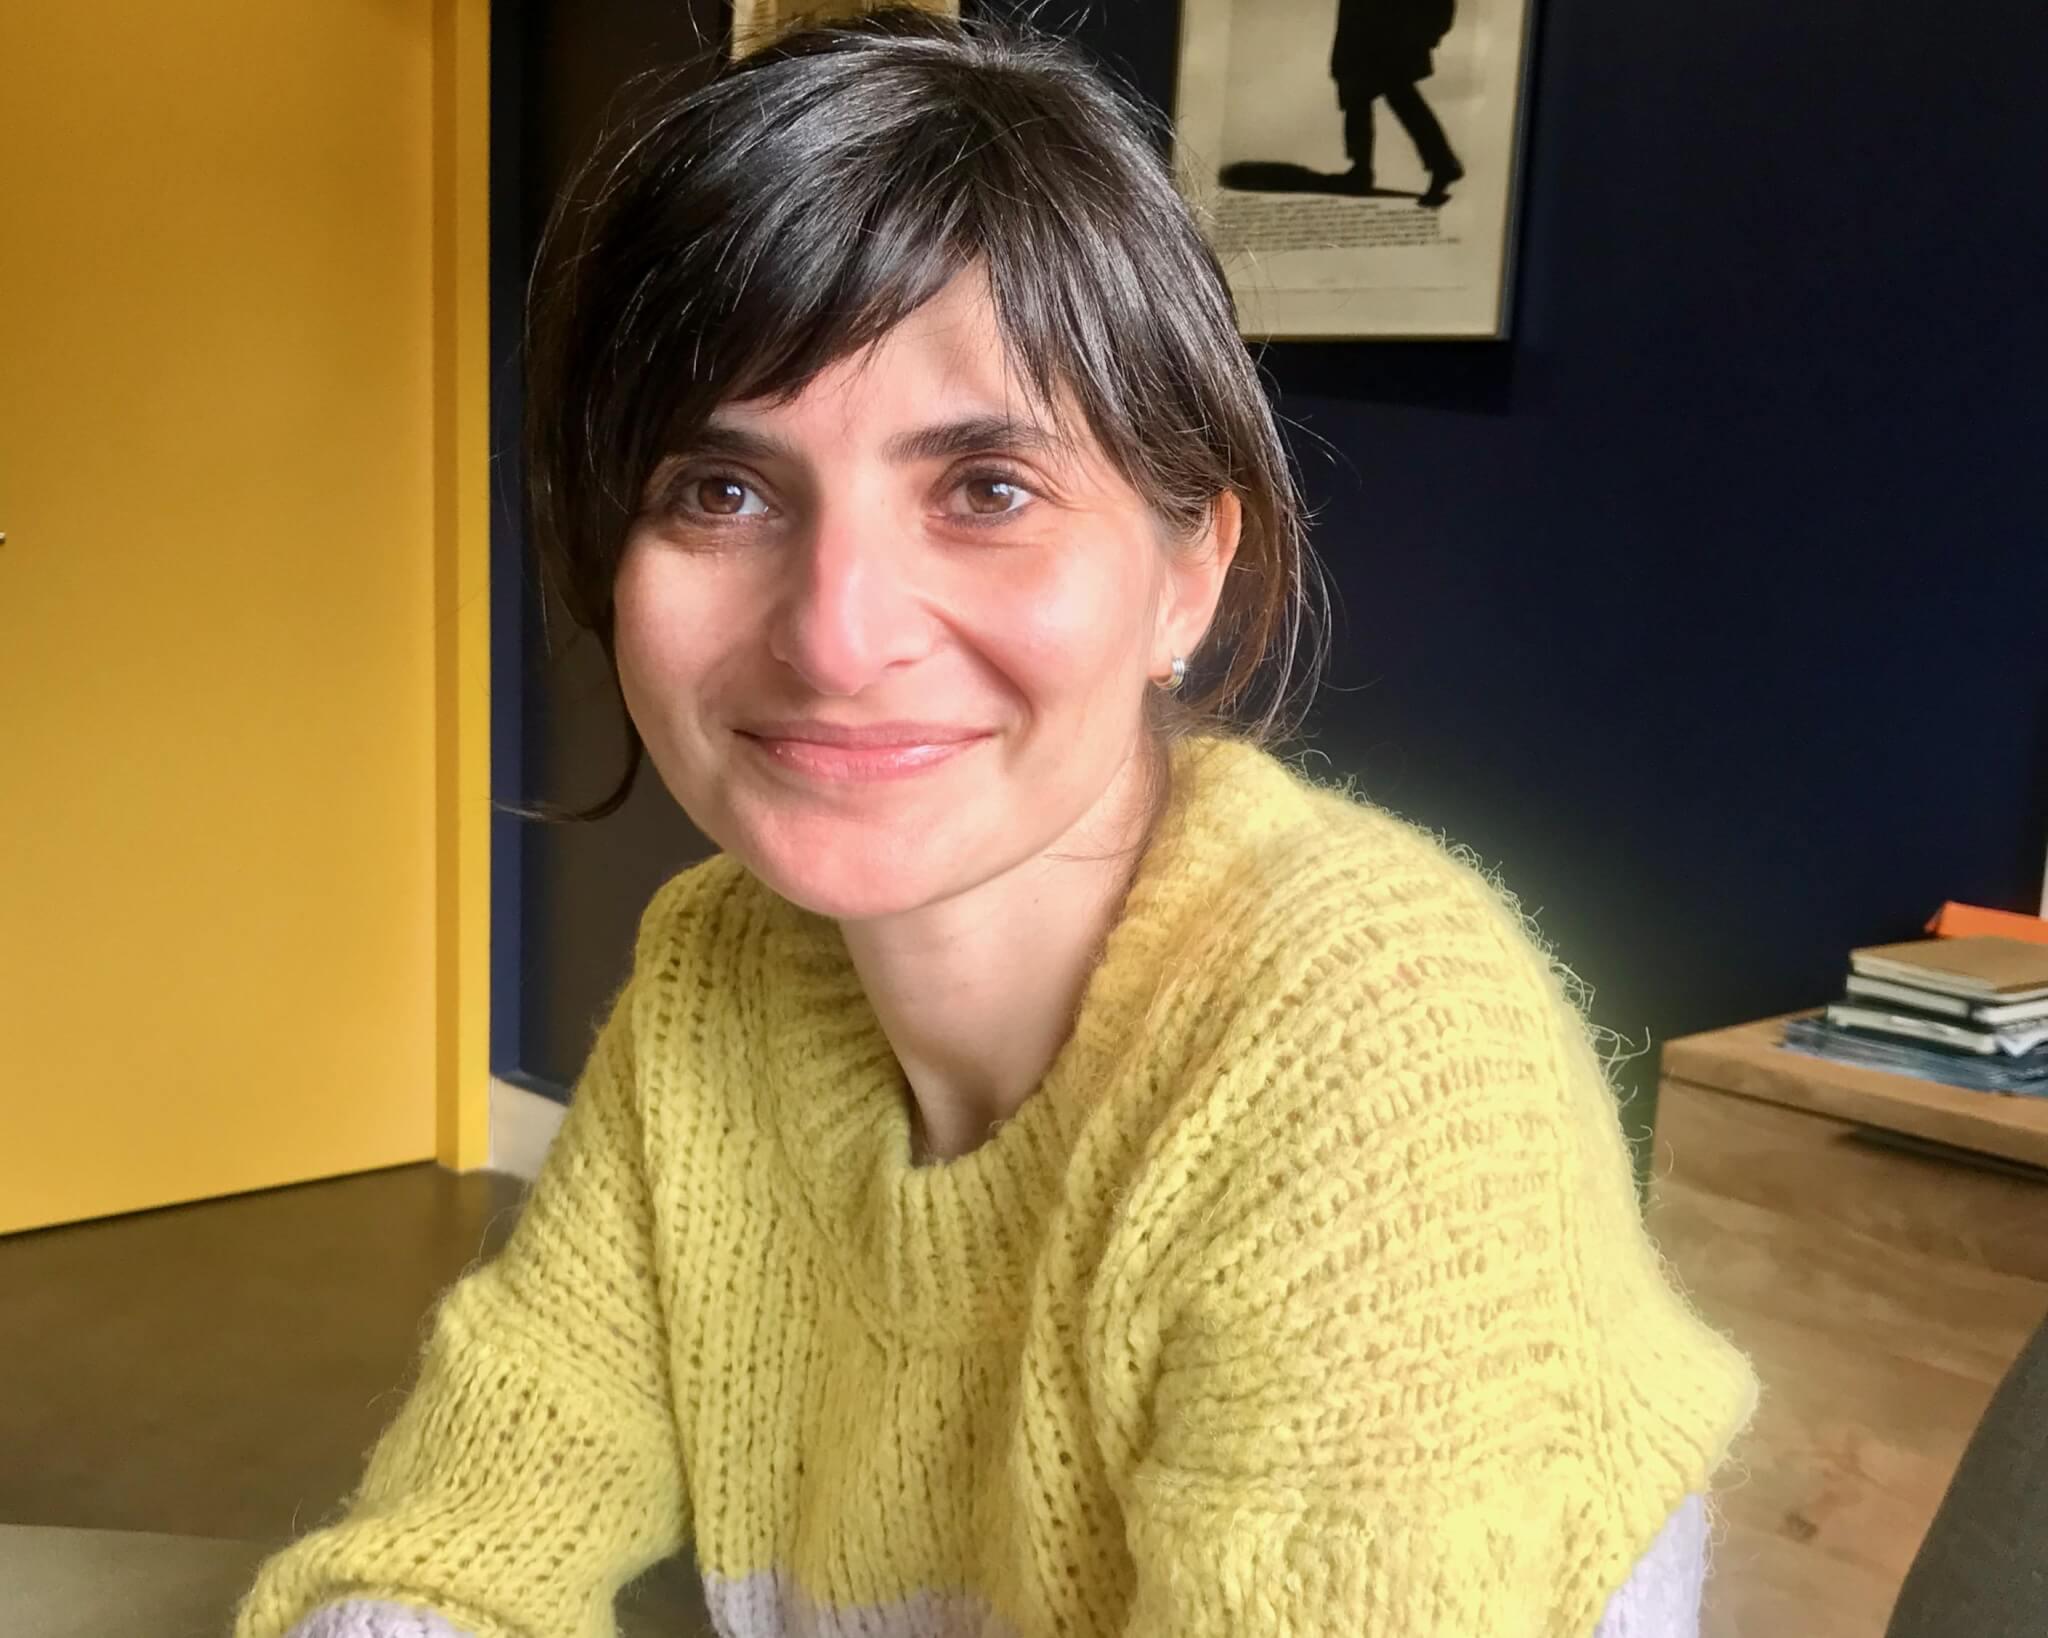 Charlotte Farcet